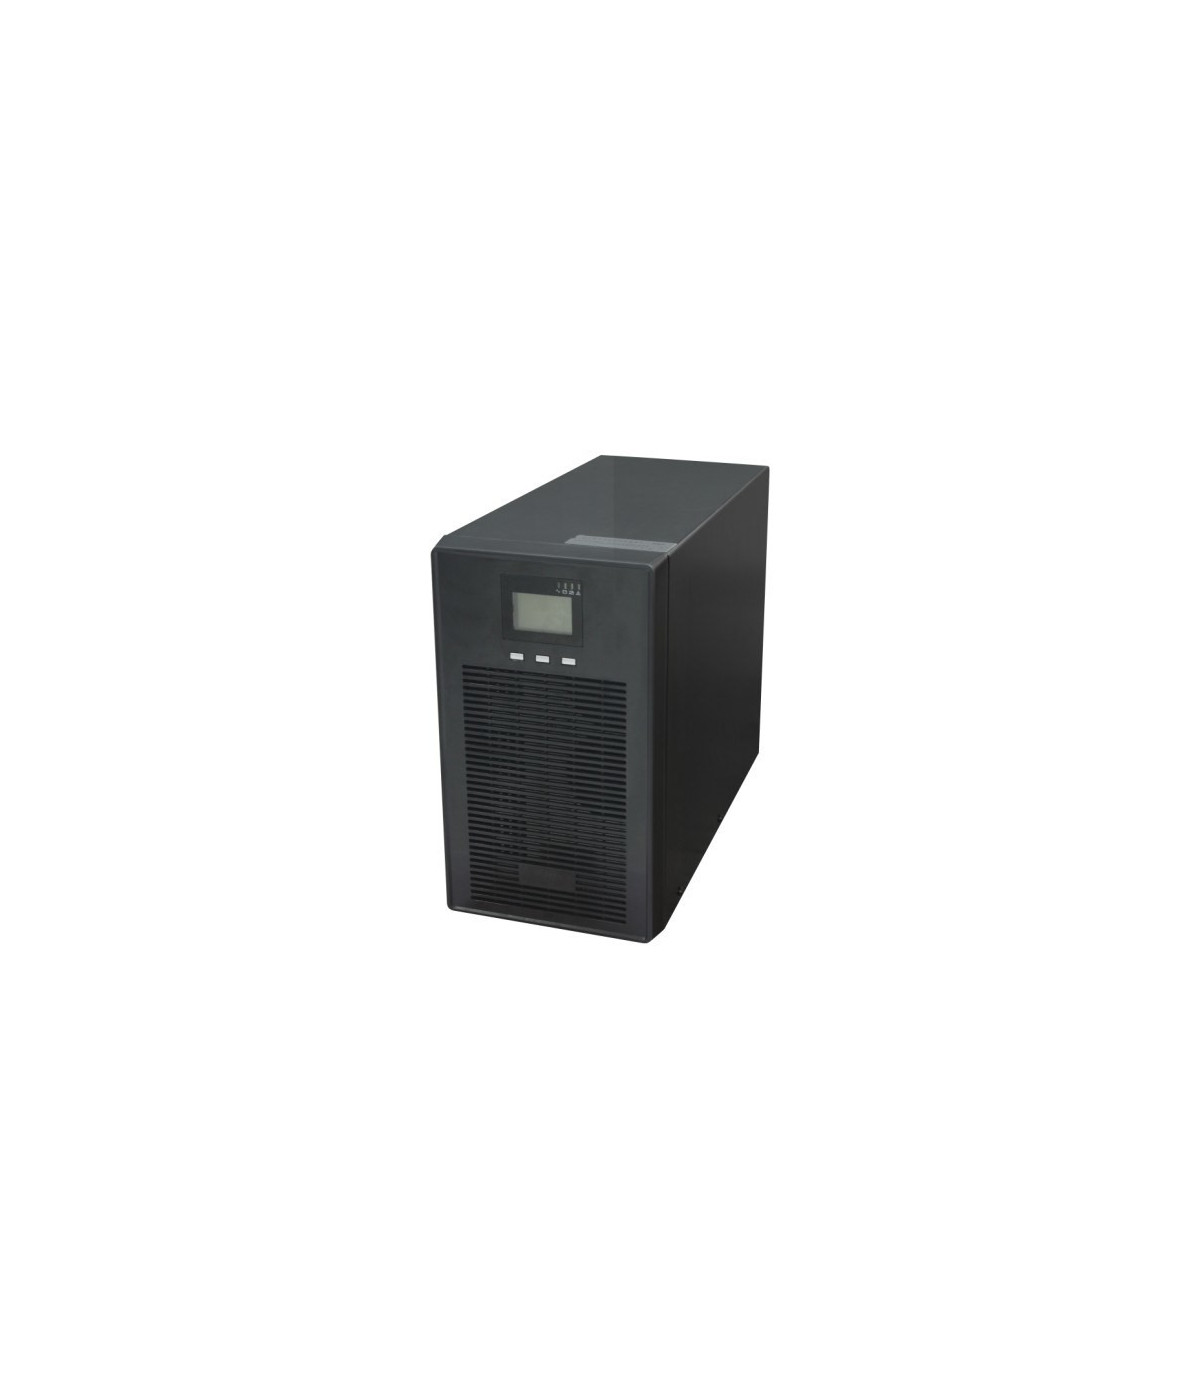 UPS POWER BACK 1000VA ONLINE (EA901II)